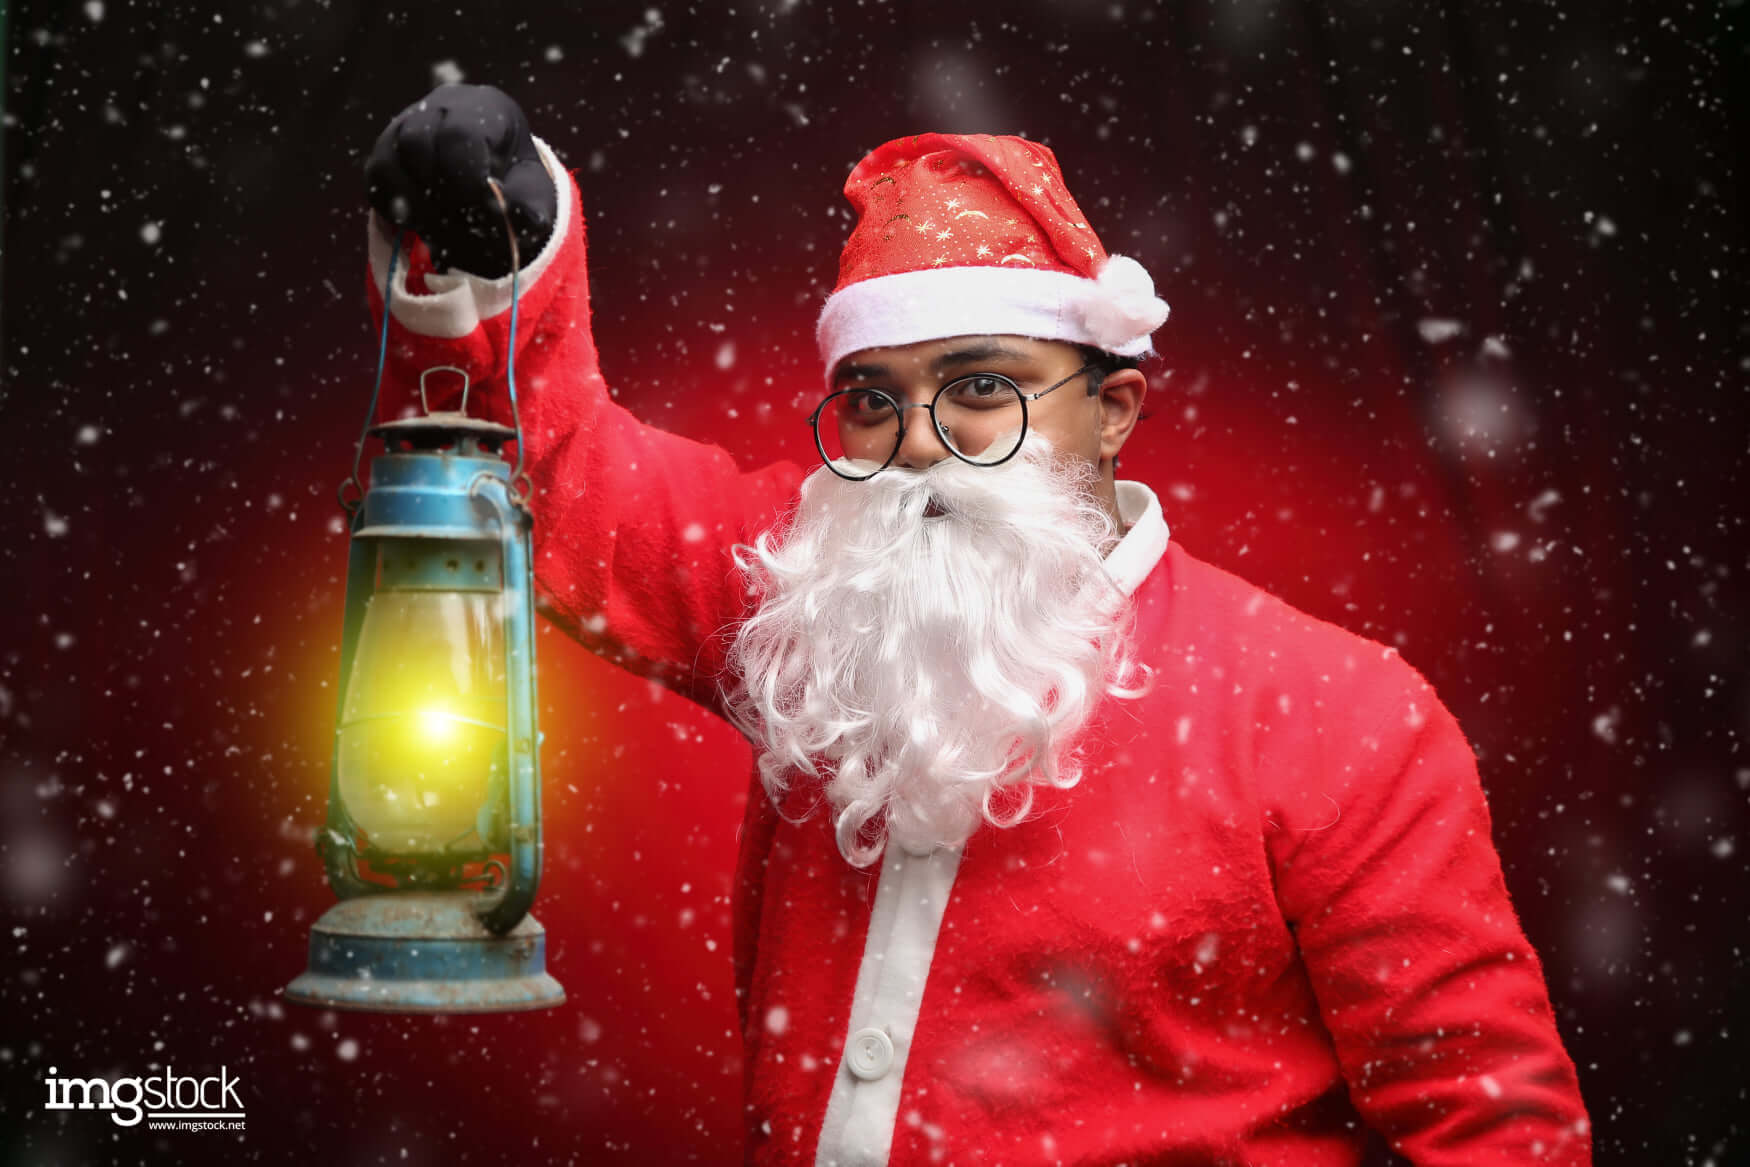 Karan Soni - Christmas Photoshoot, ImgStock